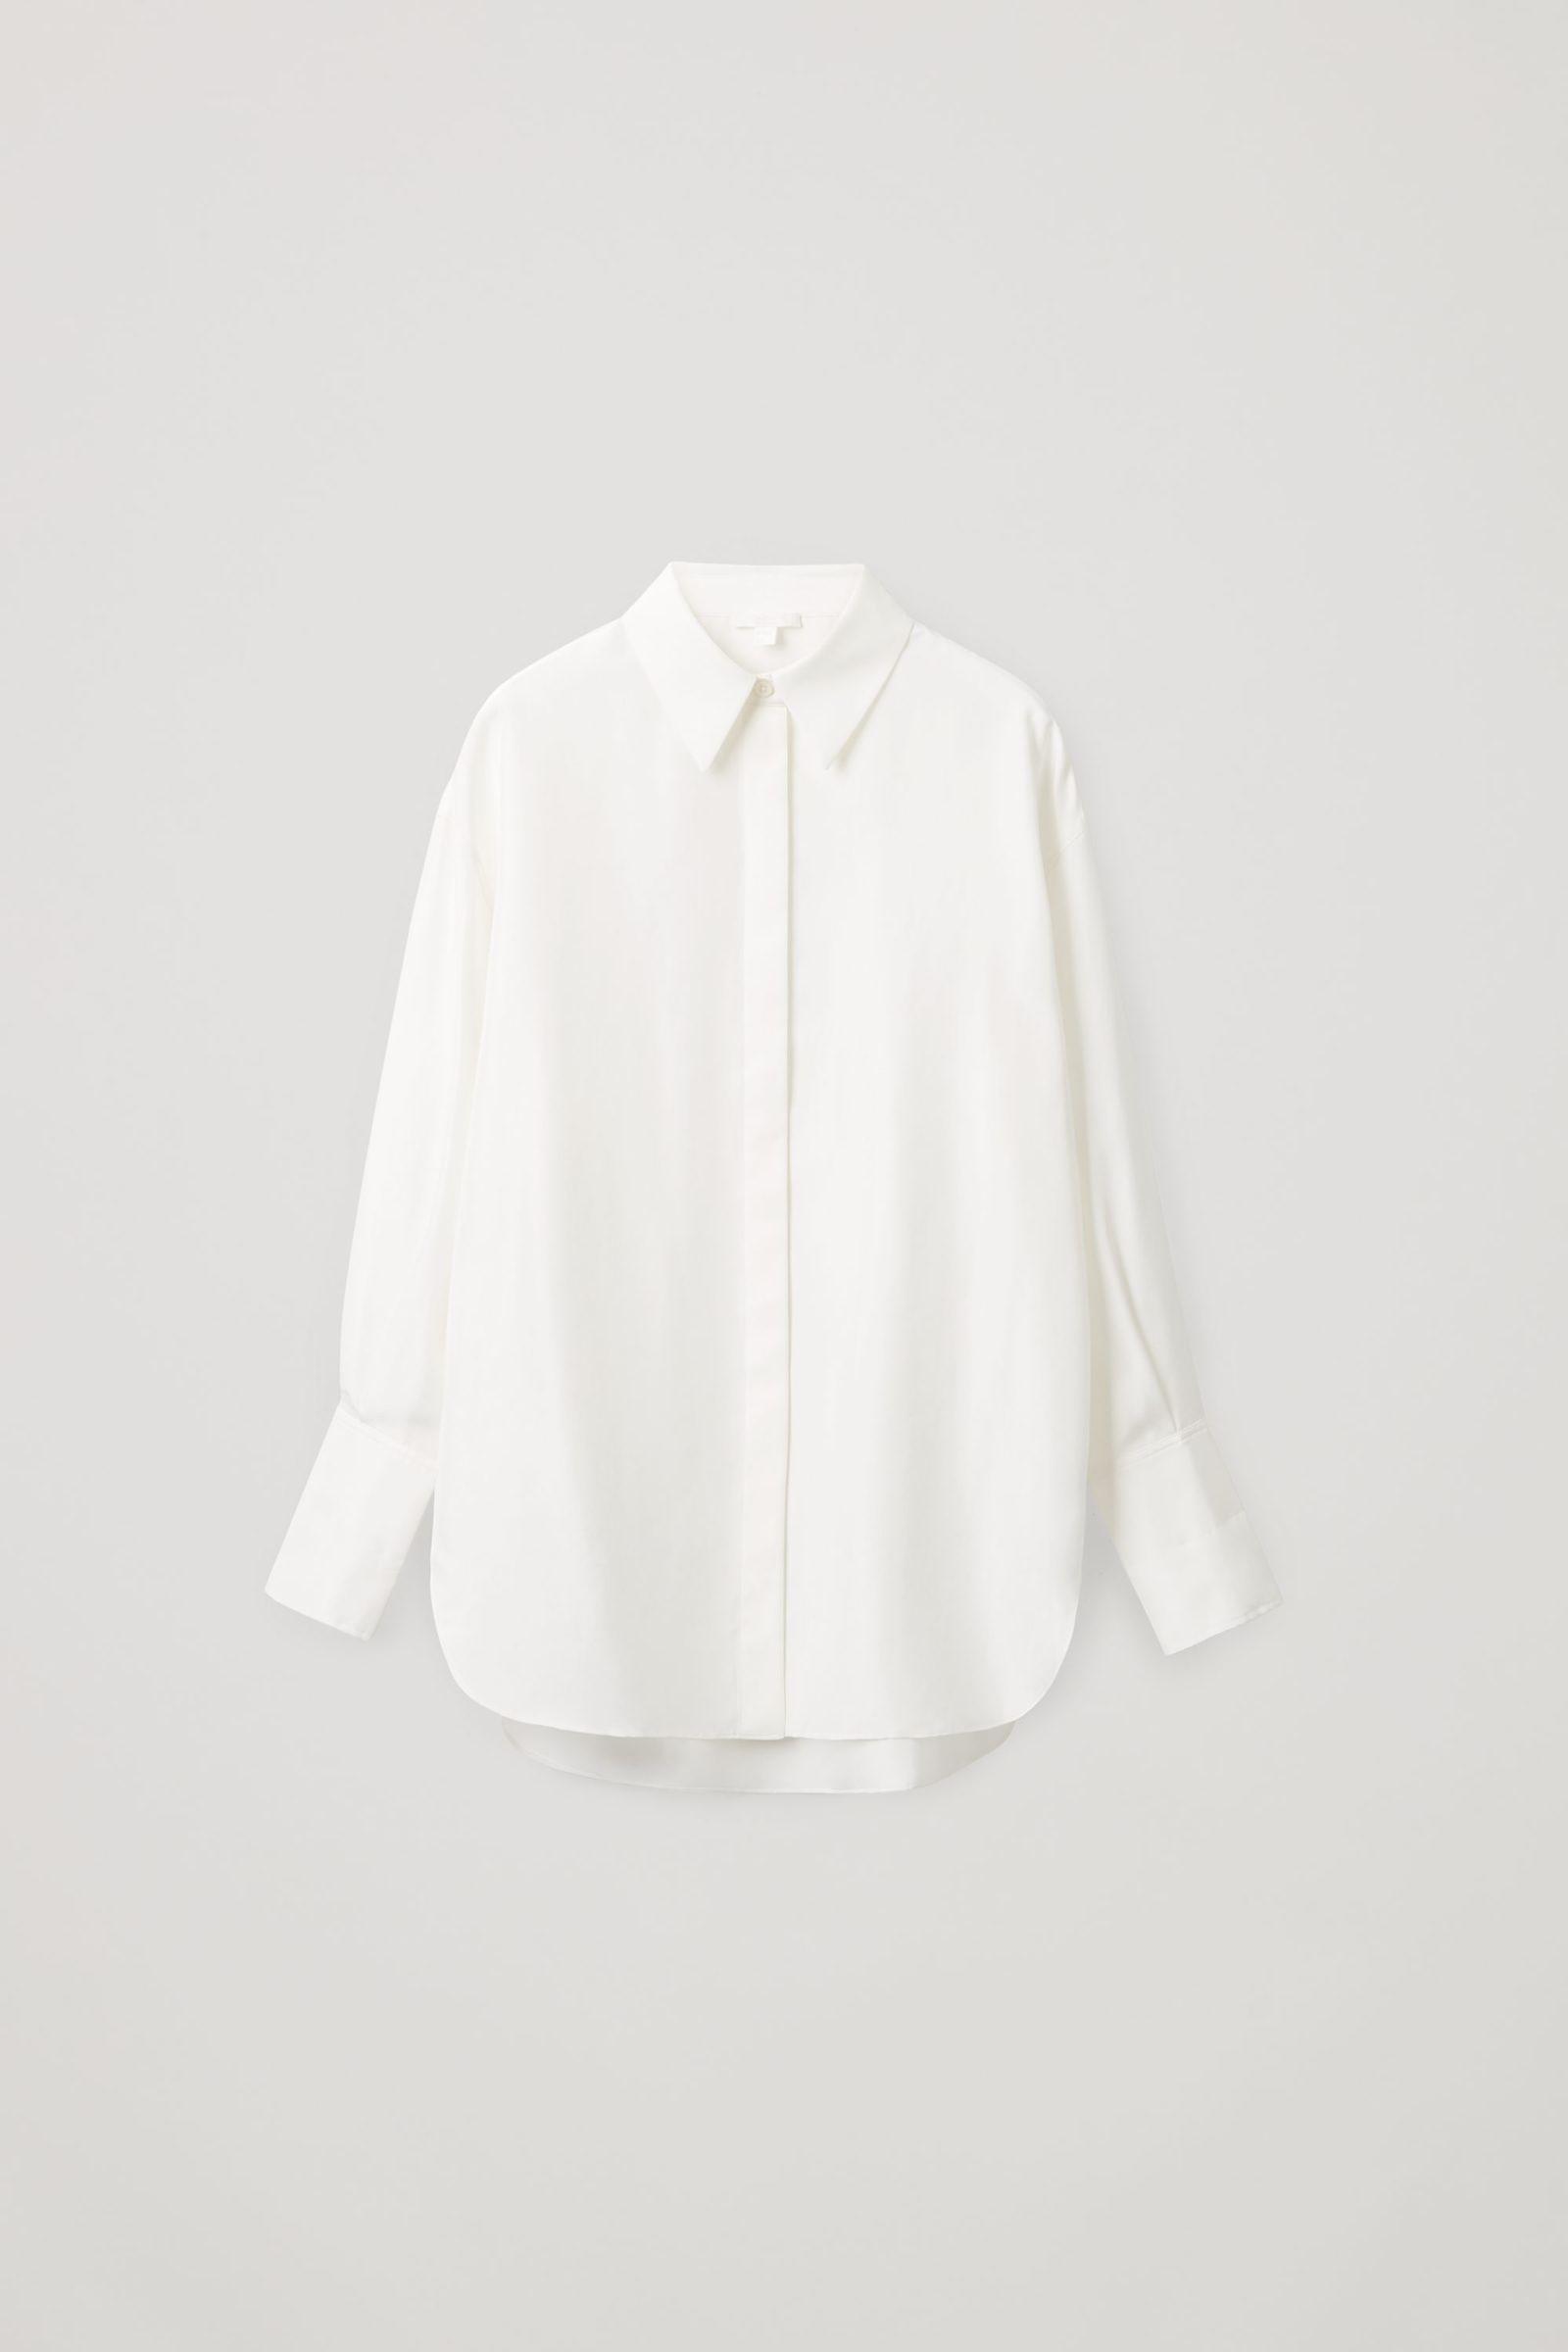 COS 멀버리 실크 오버사이즈 셔츠의 화이트컬러 Product입니다.